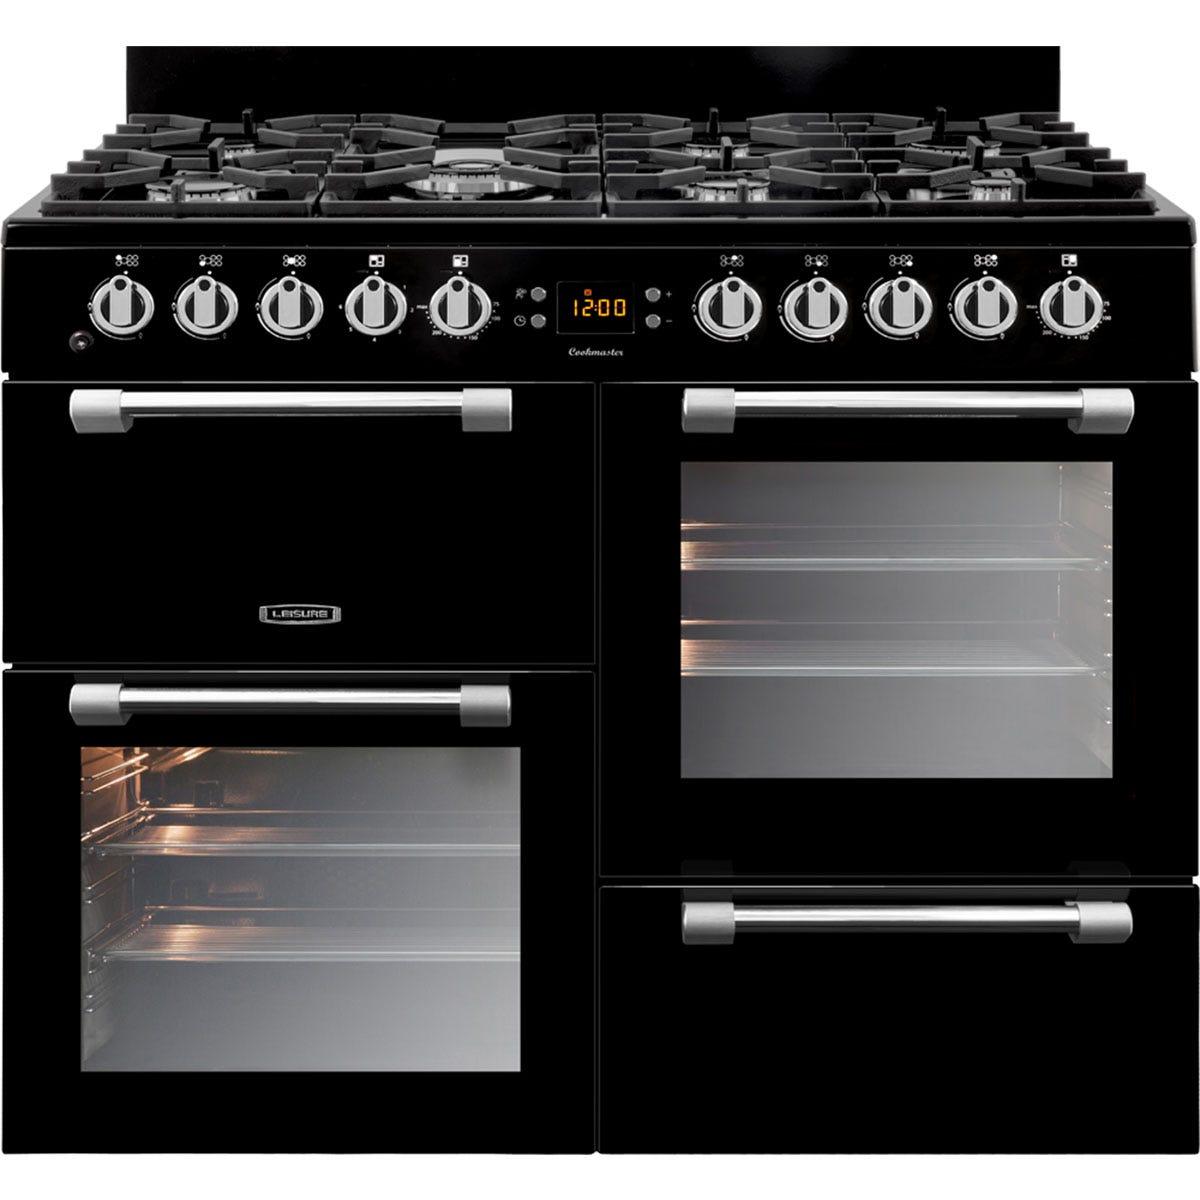 Leisure CK100G232K 100cm Cookmaster Gas Range Cooker - Black